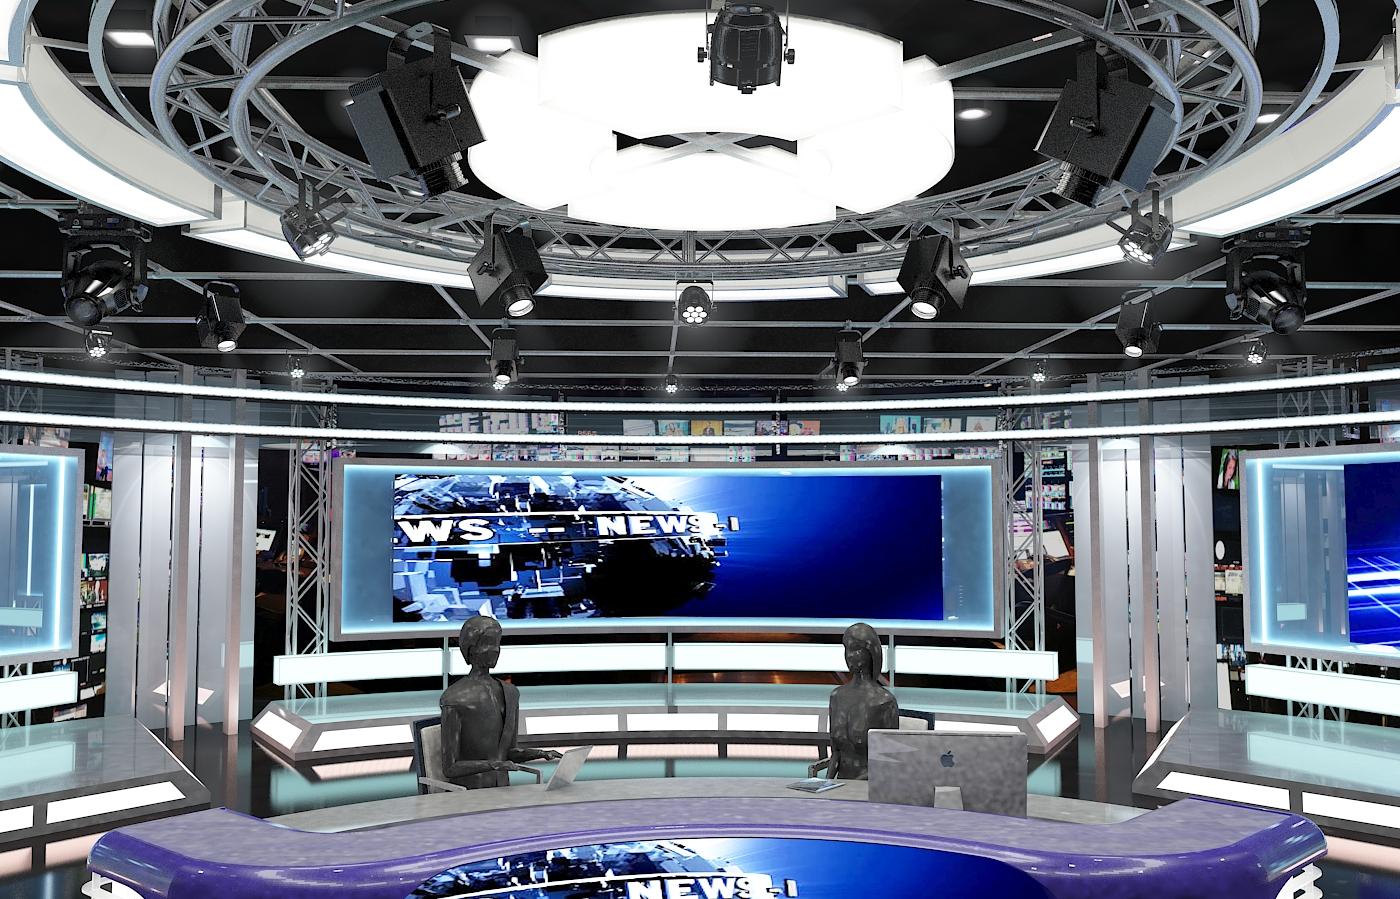 виртуал телевизийн студи цуглуулга vol 6 3d загвар max dxf dwg fbx obj 223371